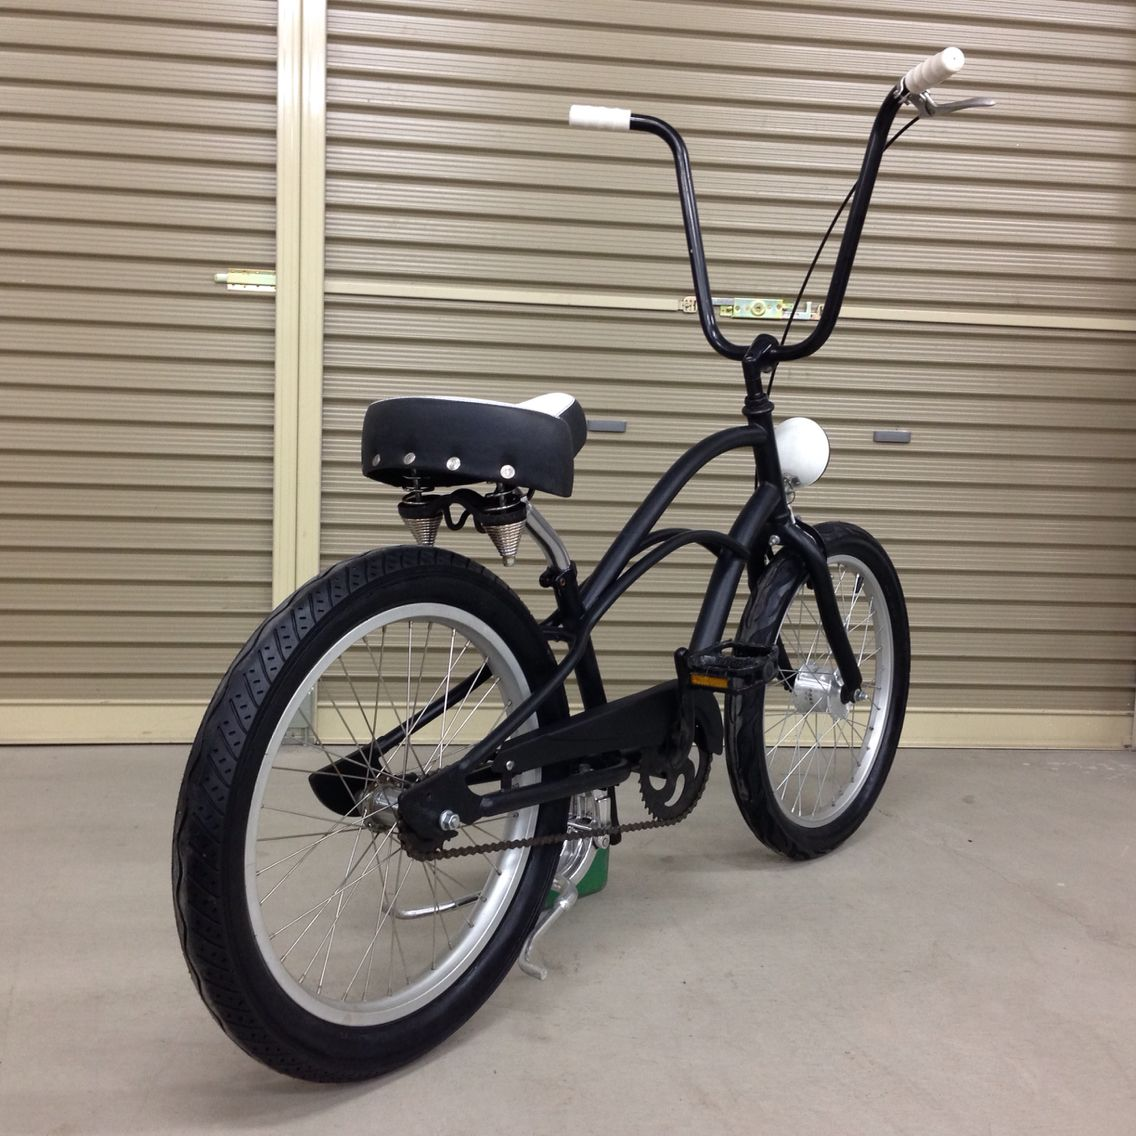 Bicycle Mx Brake Rear Alloy White Lowrider MTB BMX Cruiser Chopper Bike Cycling